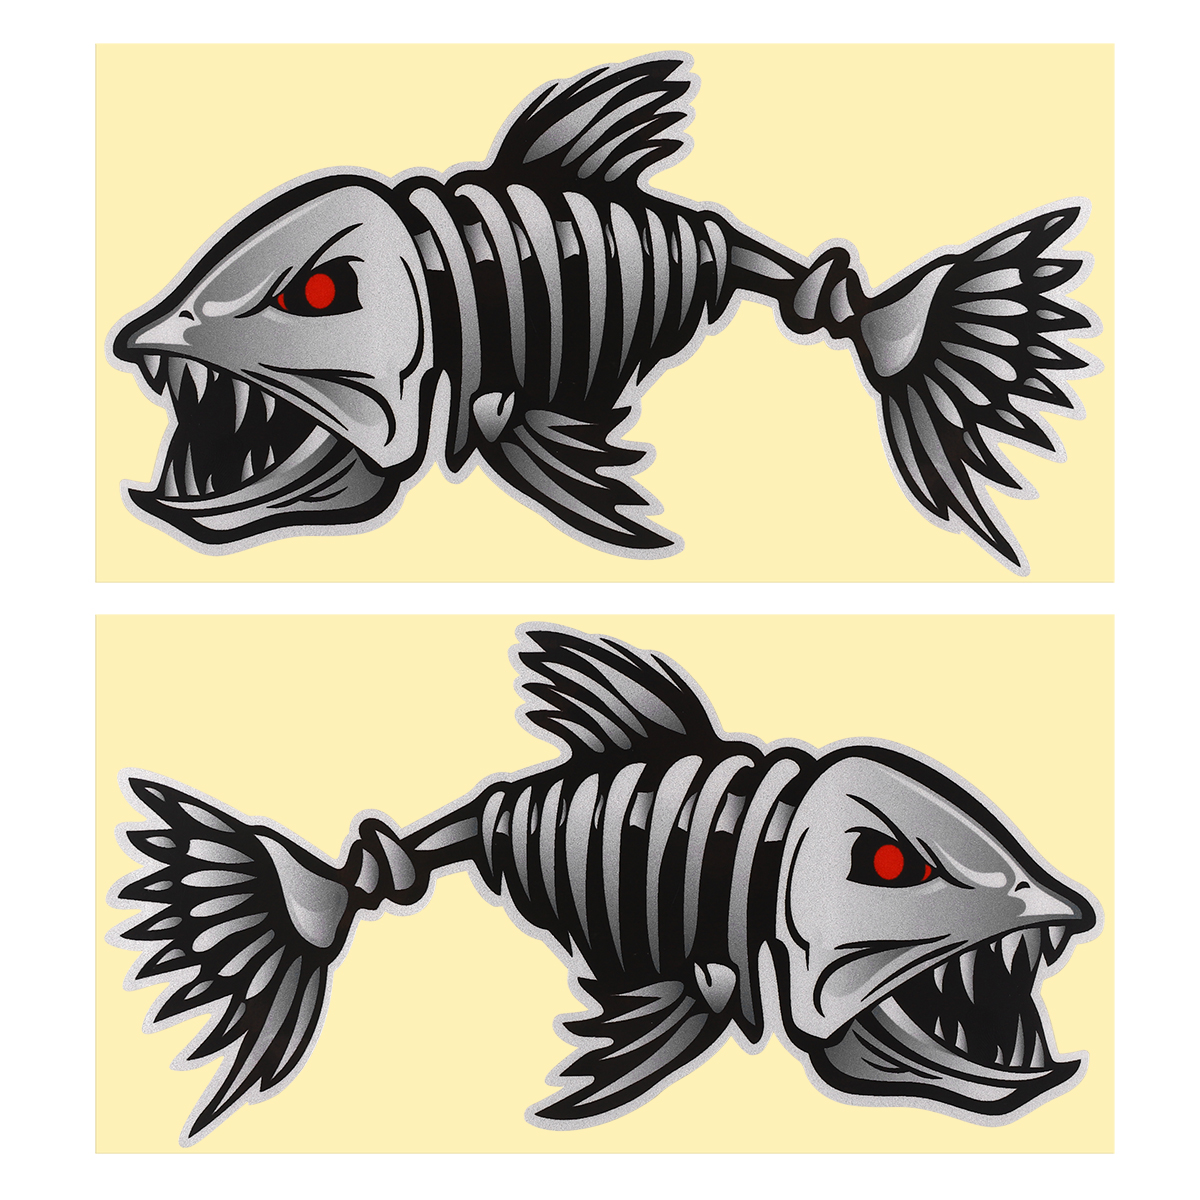 2pcs Evil Skeleton Fish Bones Vinyl Decal Sticker Kayak Fishing Boat Car Graphic